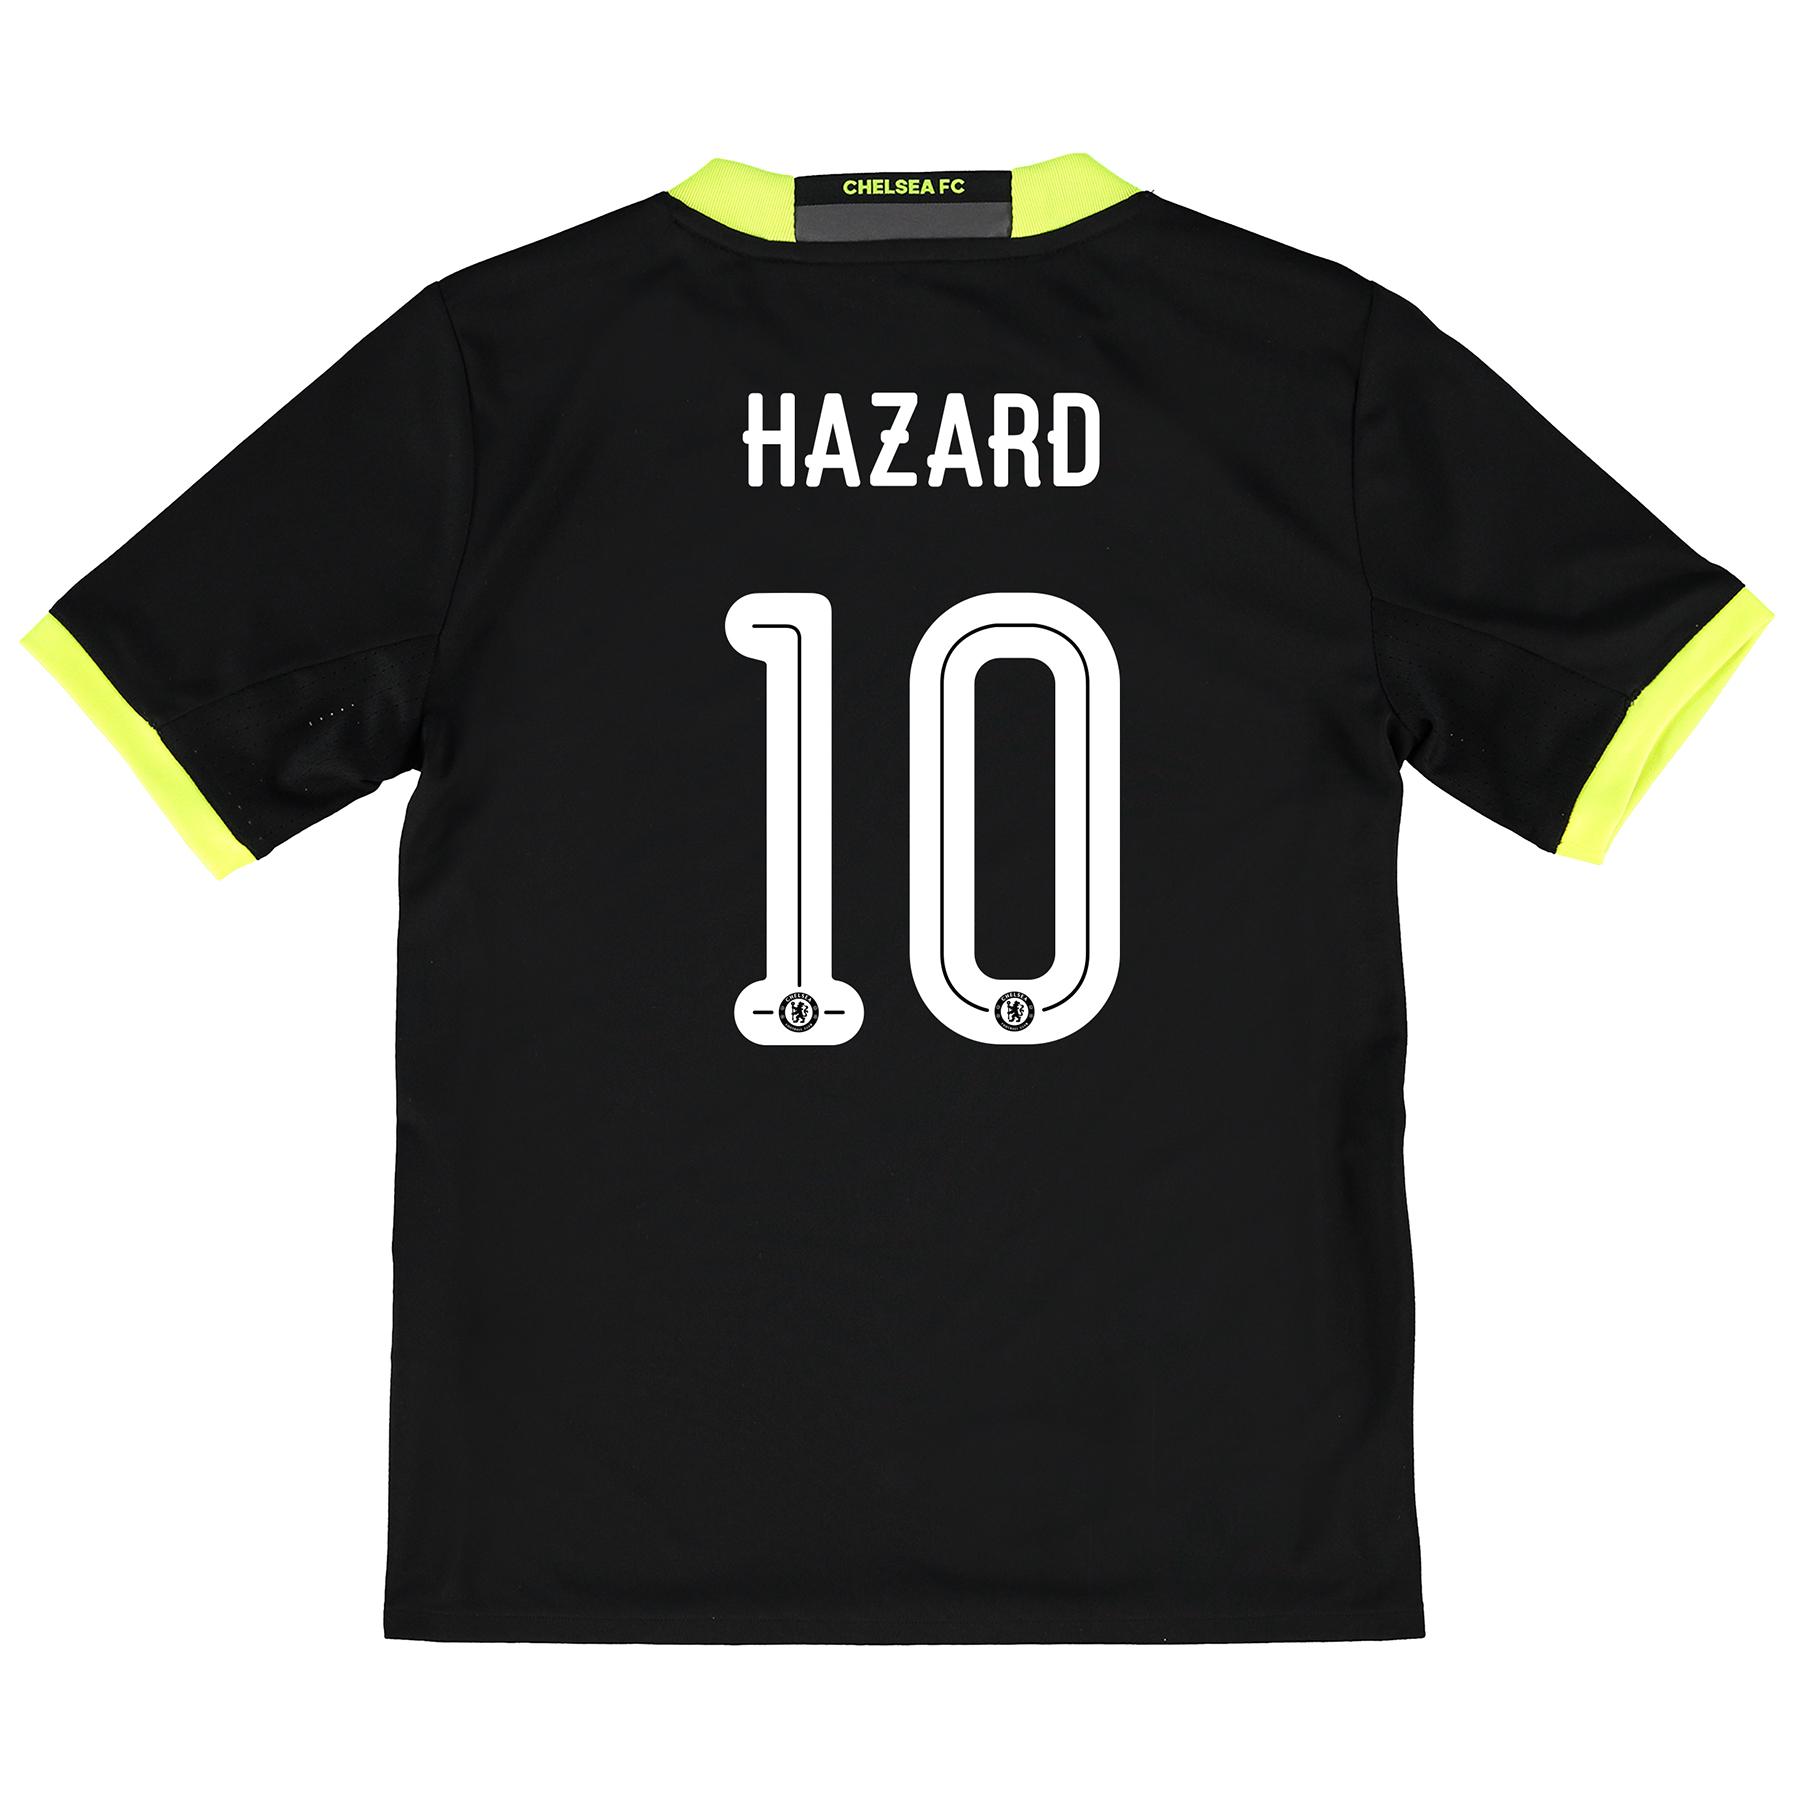 Chelsea Linear Away Shirt 16-17 - Kids with Hazard 10 printing